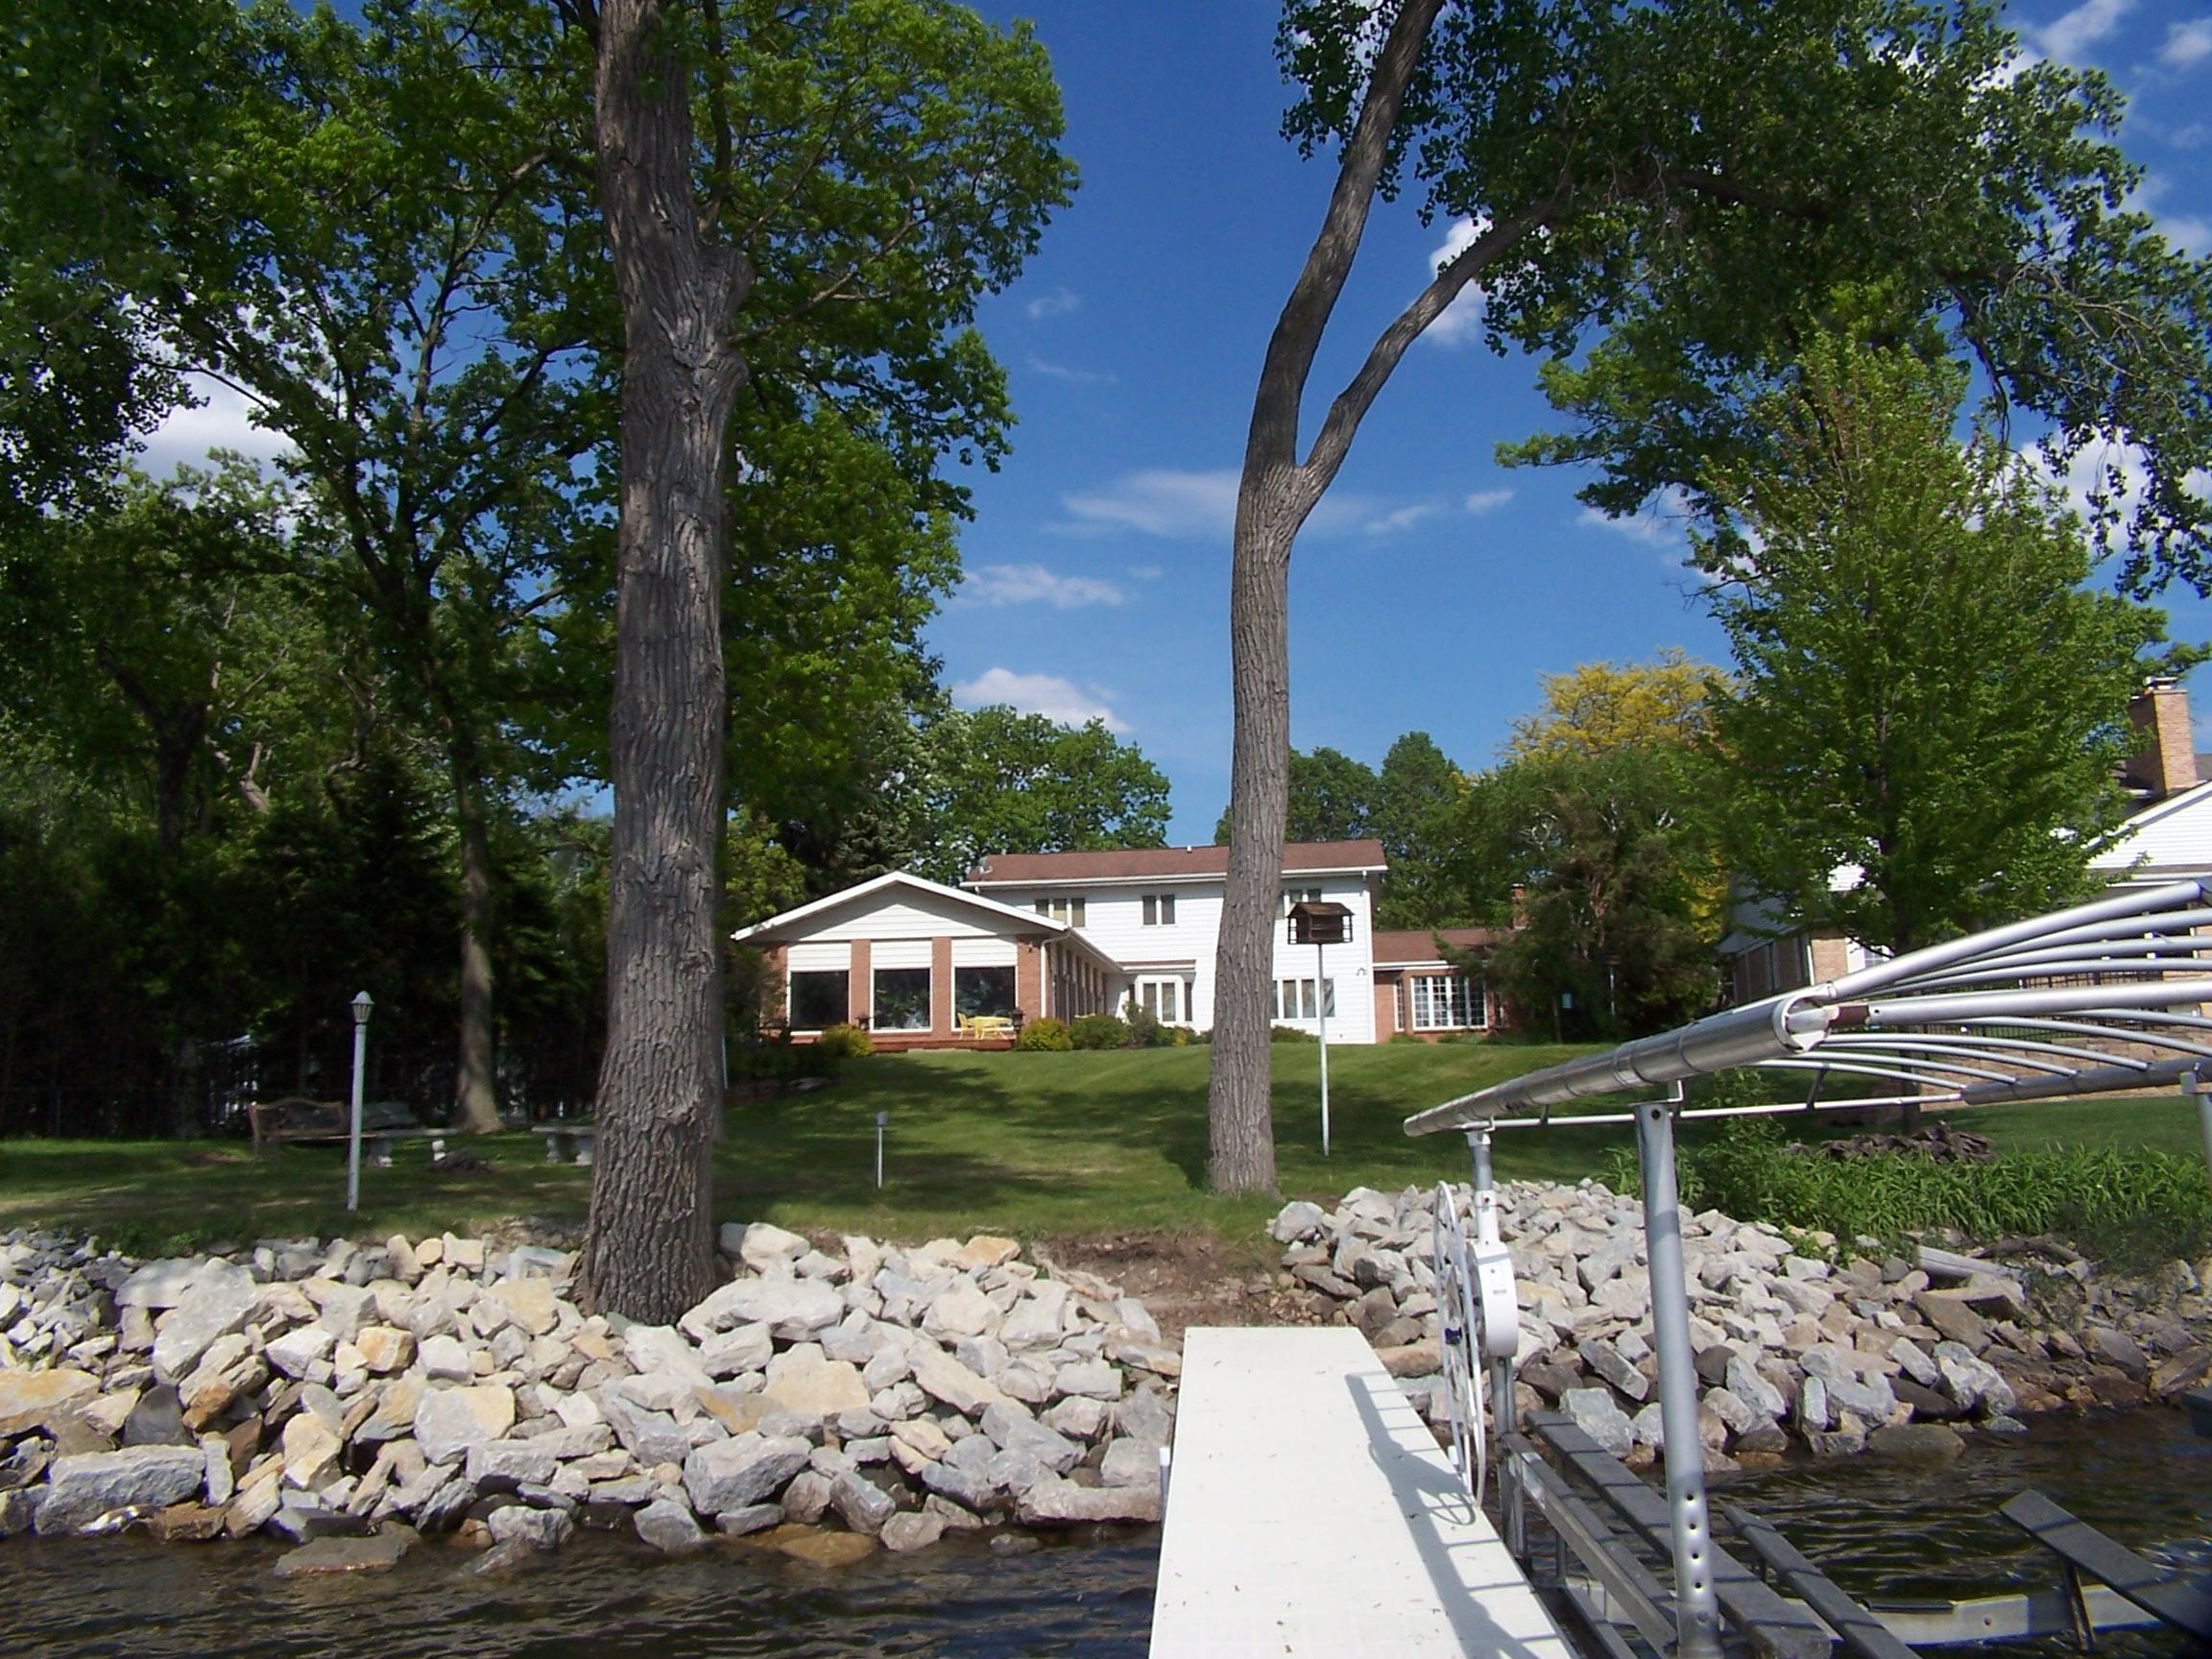 1120 Lake Shore Dr, Beaver Dam, Wisconsin 53916